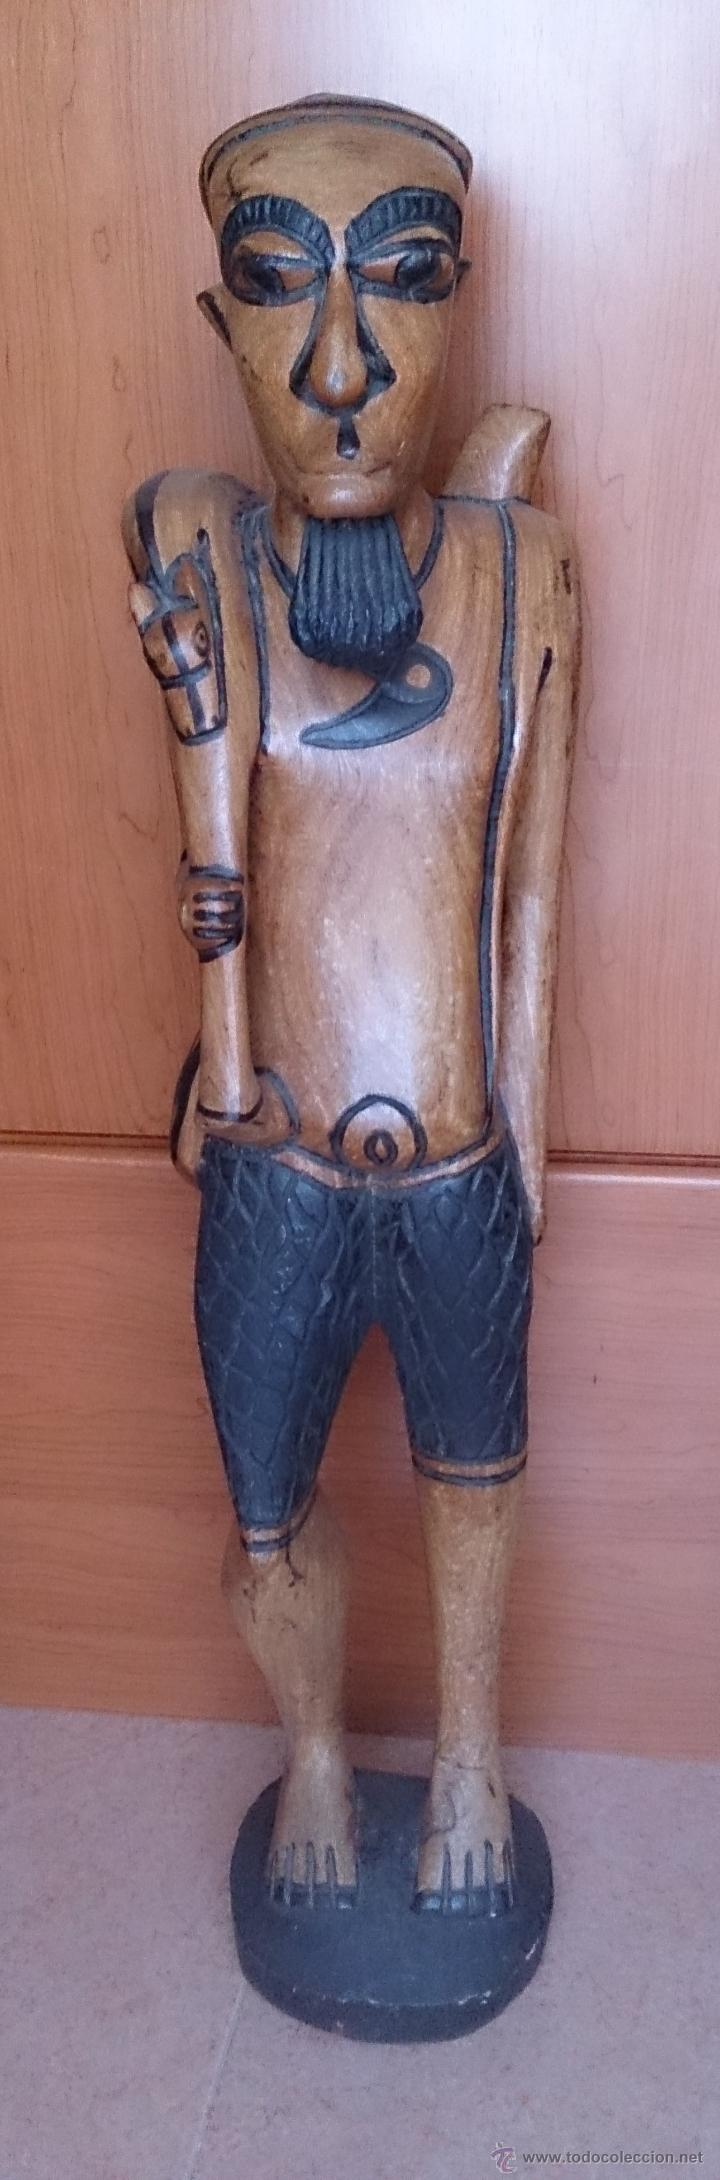 Arte: Gran talla indígena en madera maciza ( 91,5 CM DE ALTO ) . - Foto 2 - 43242684